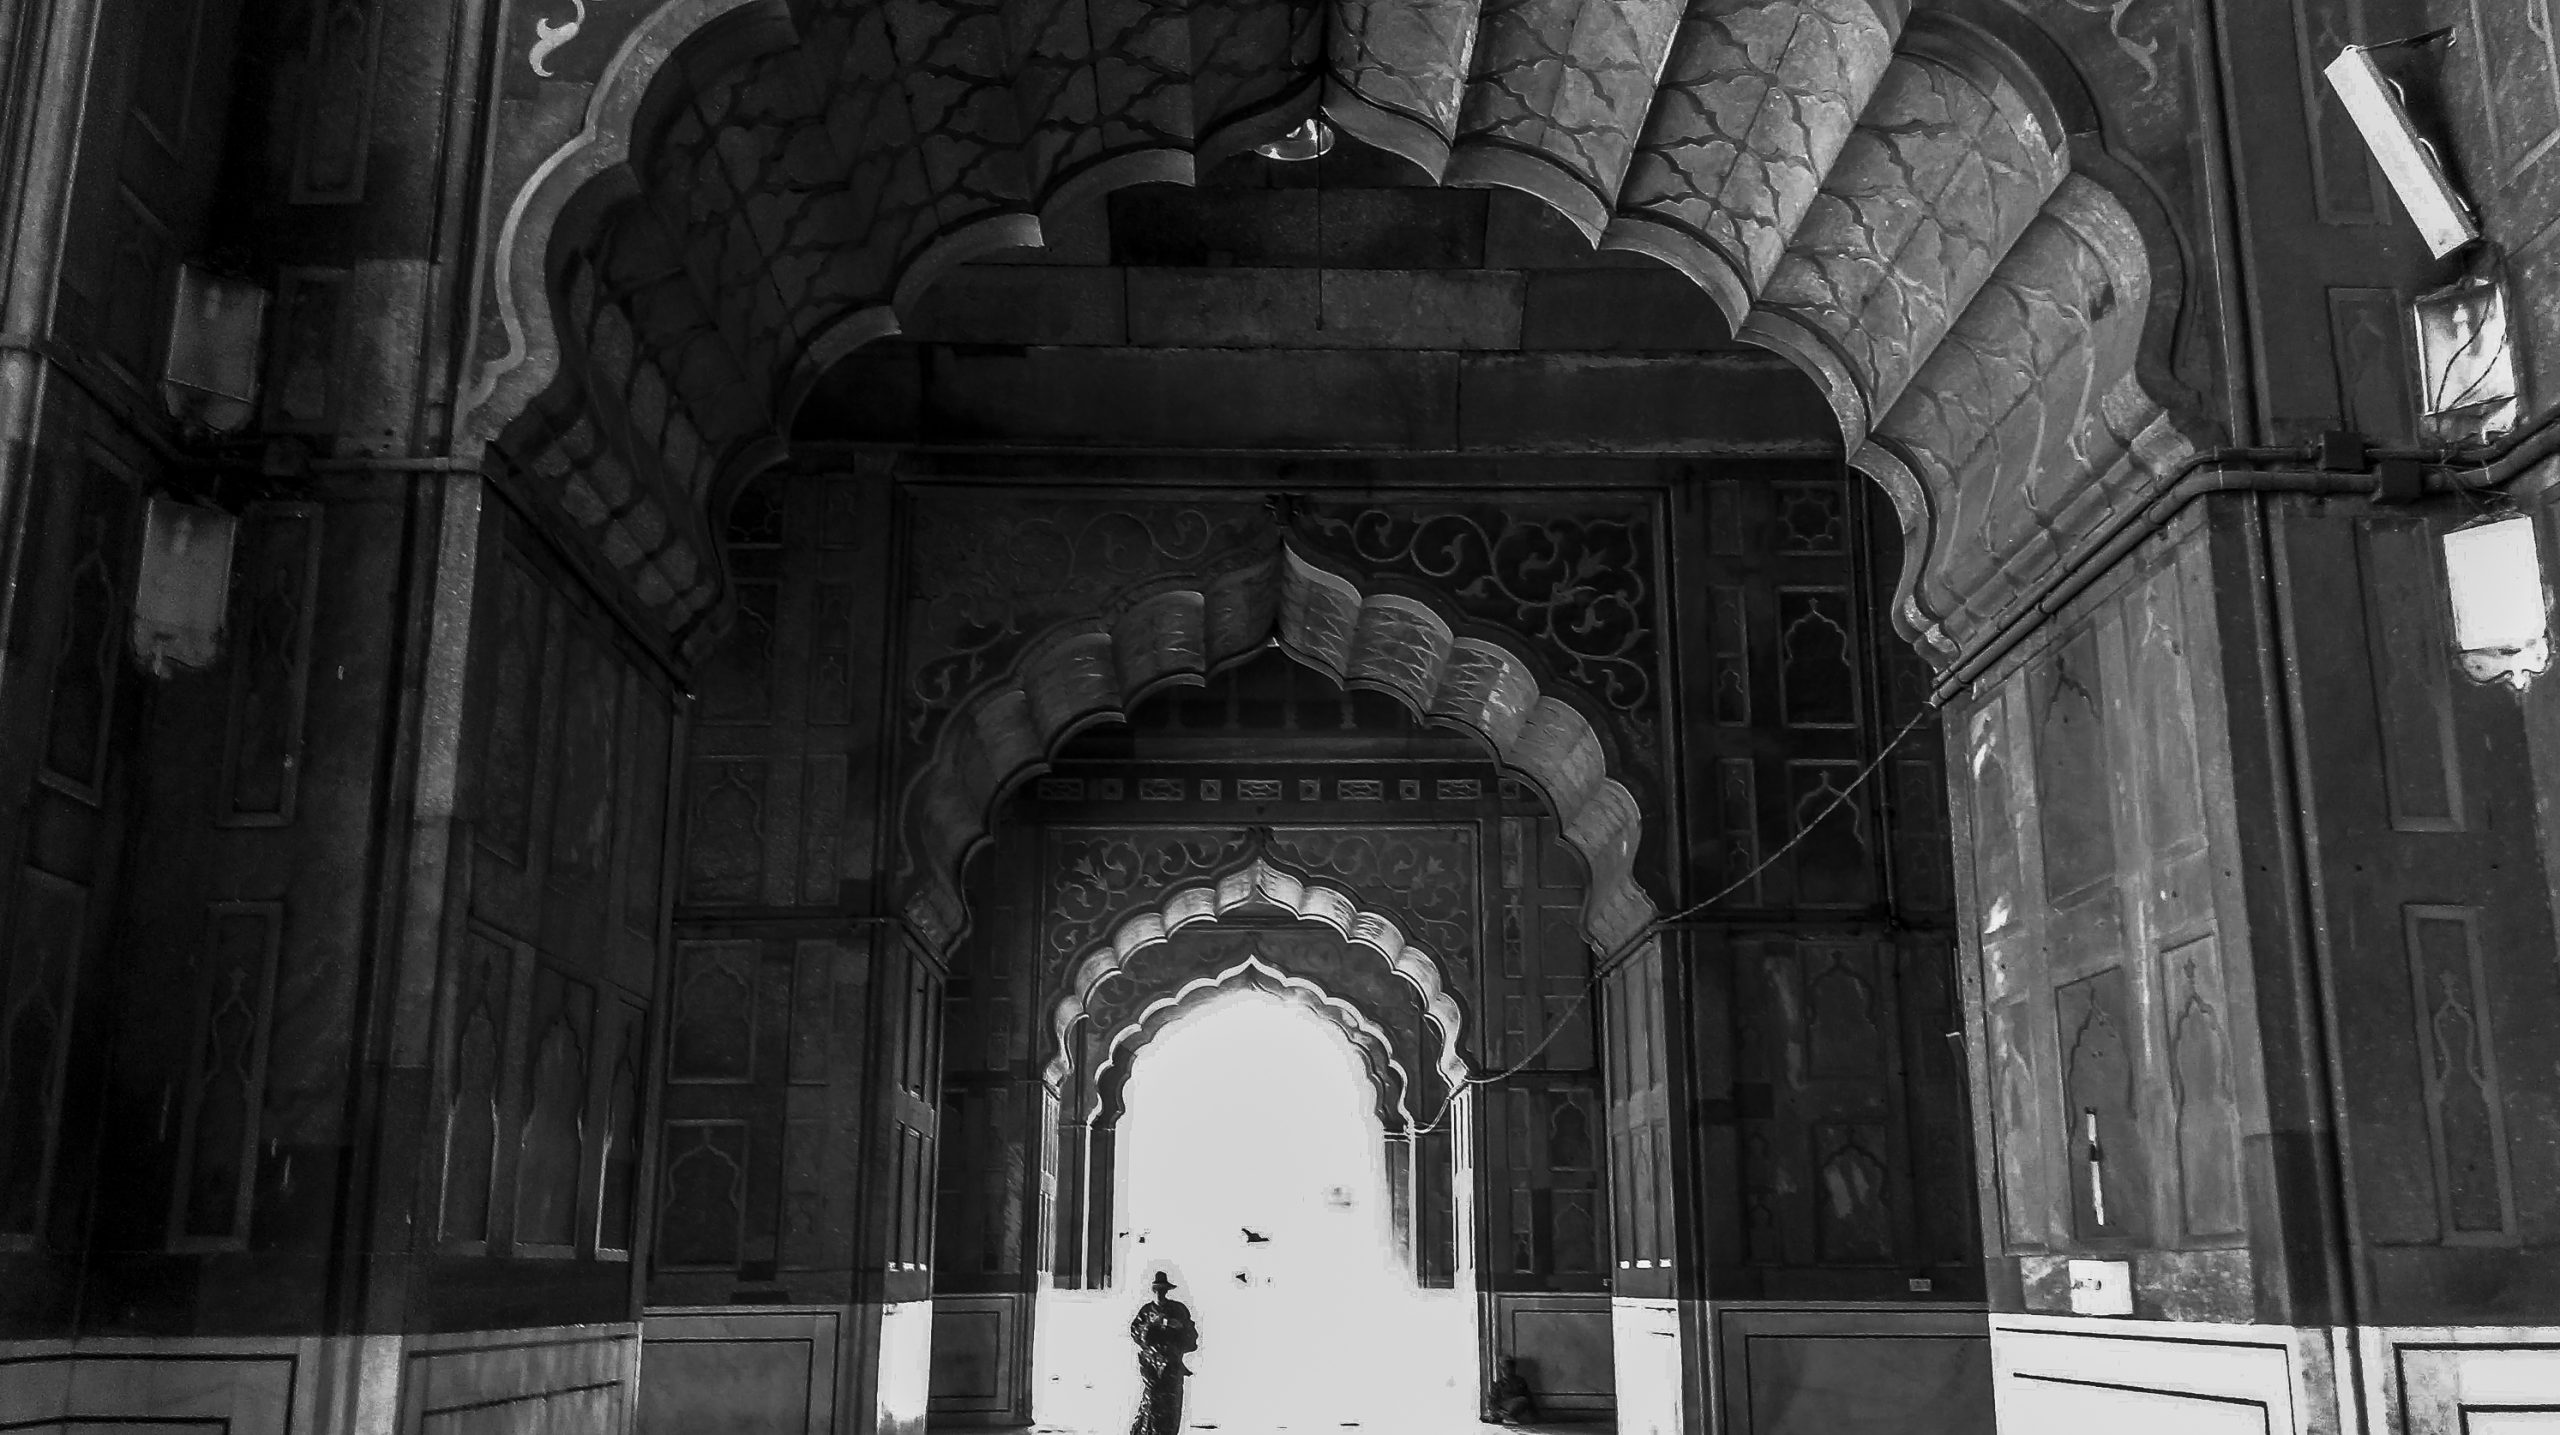 Interior of Jama Masjid in Delhi